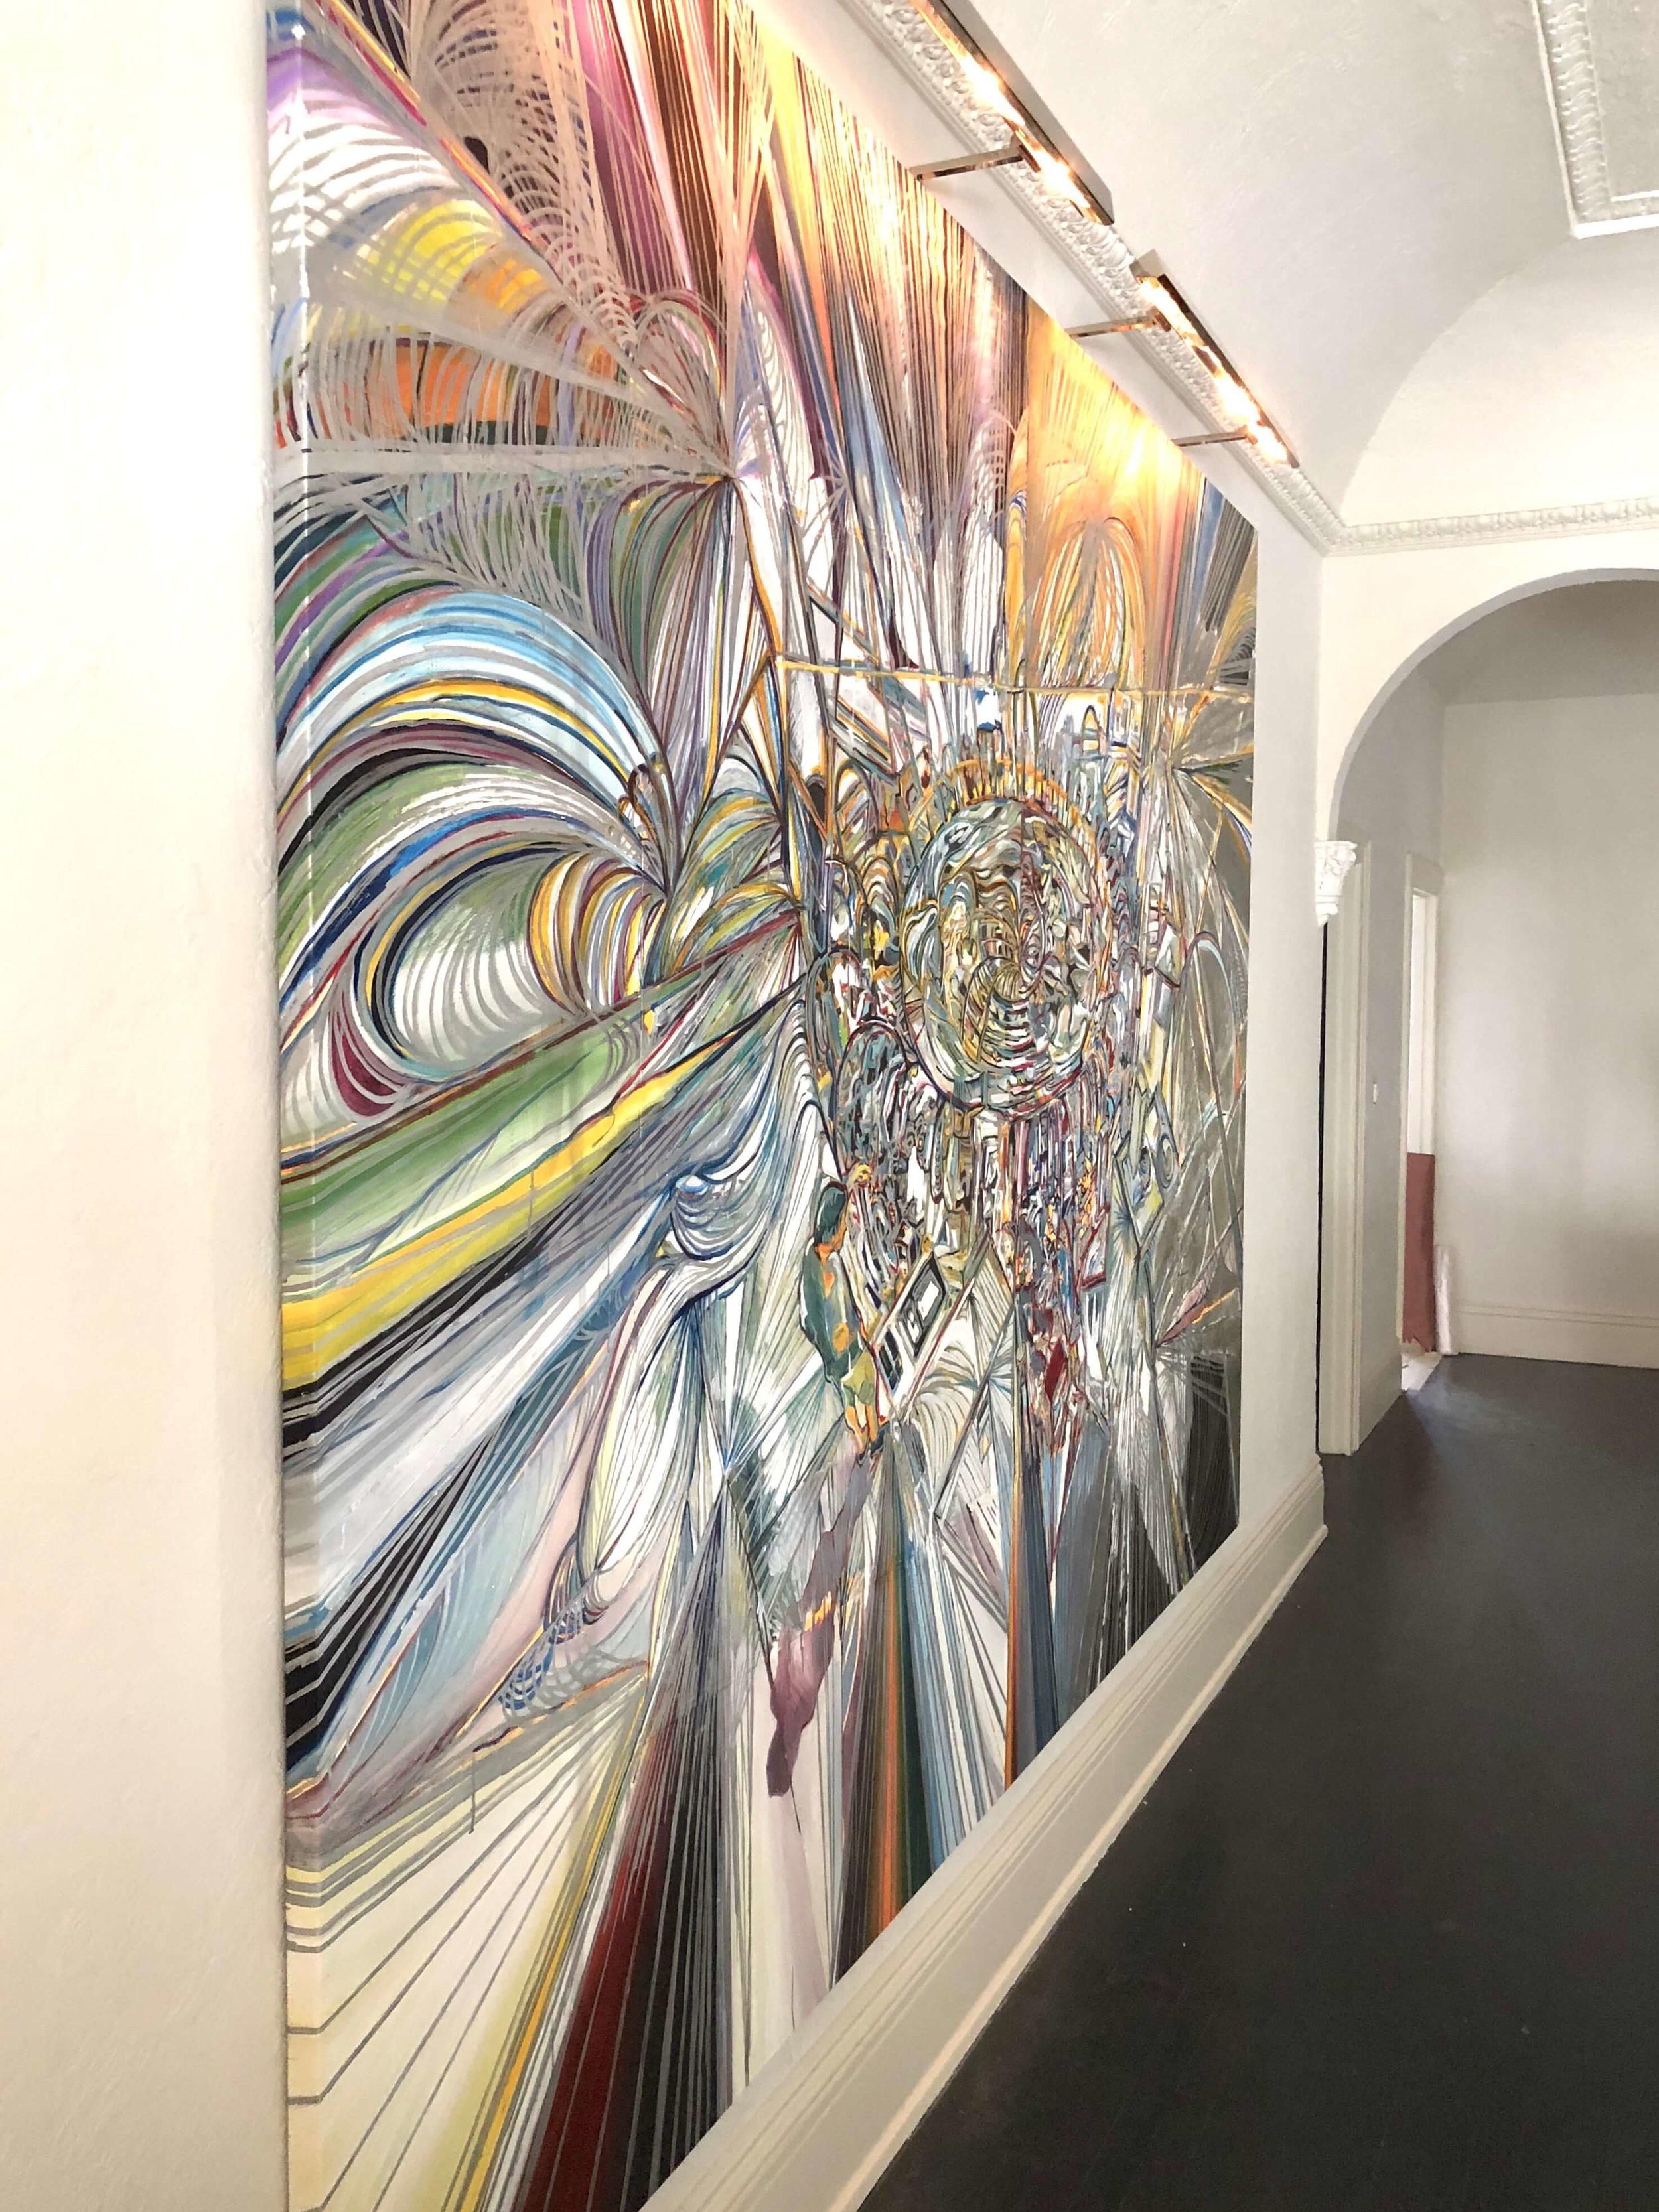 Large, oversized art by Adam Berg in upstairs hallway at Pasadena Showcase House